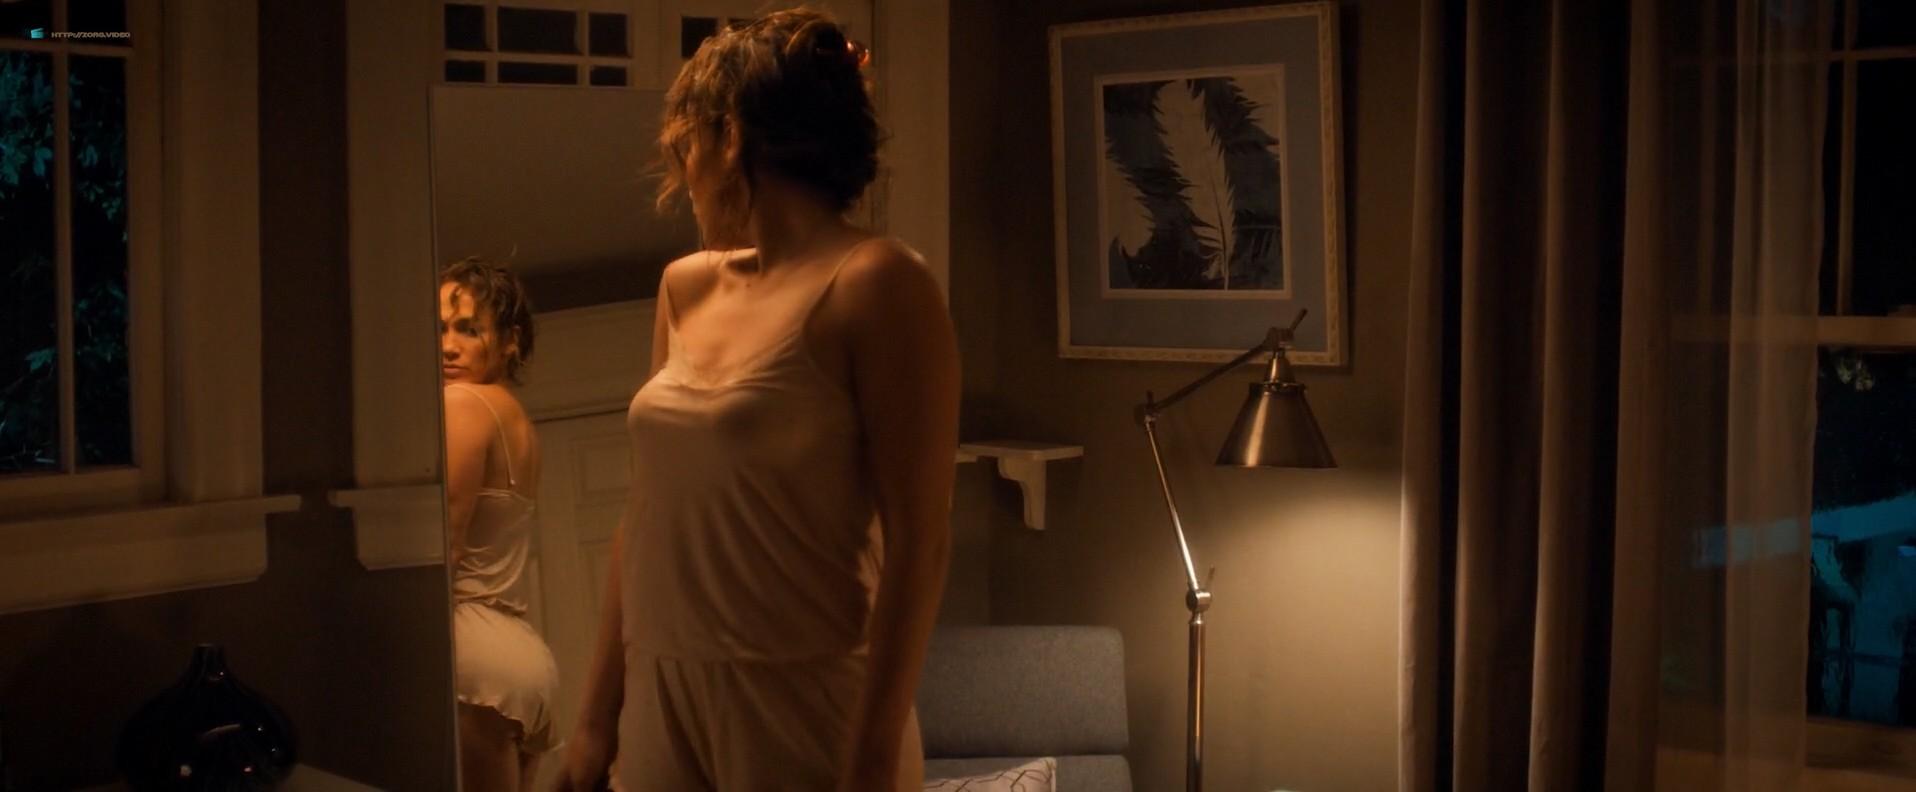 Jennifer Lopez hot sex scene and Lexi Atkins nude sex - The Boy Next Door (2015) HD 1080p (13)